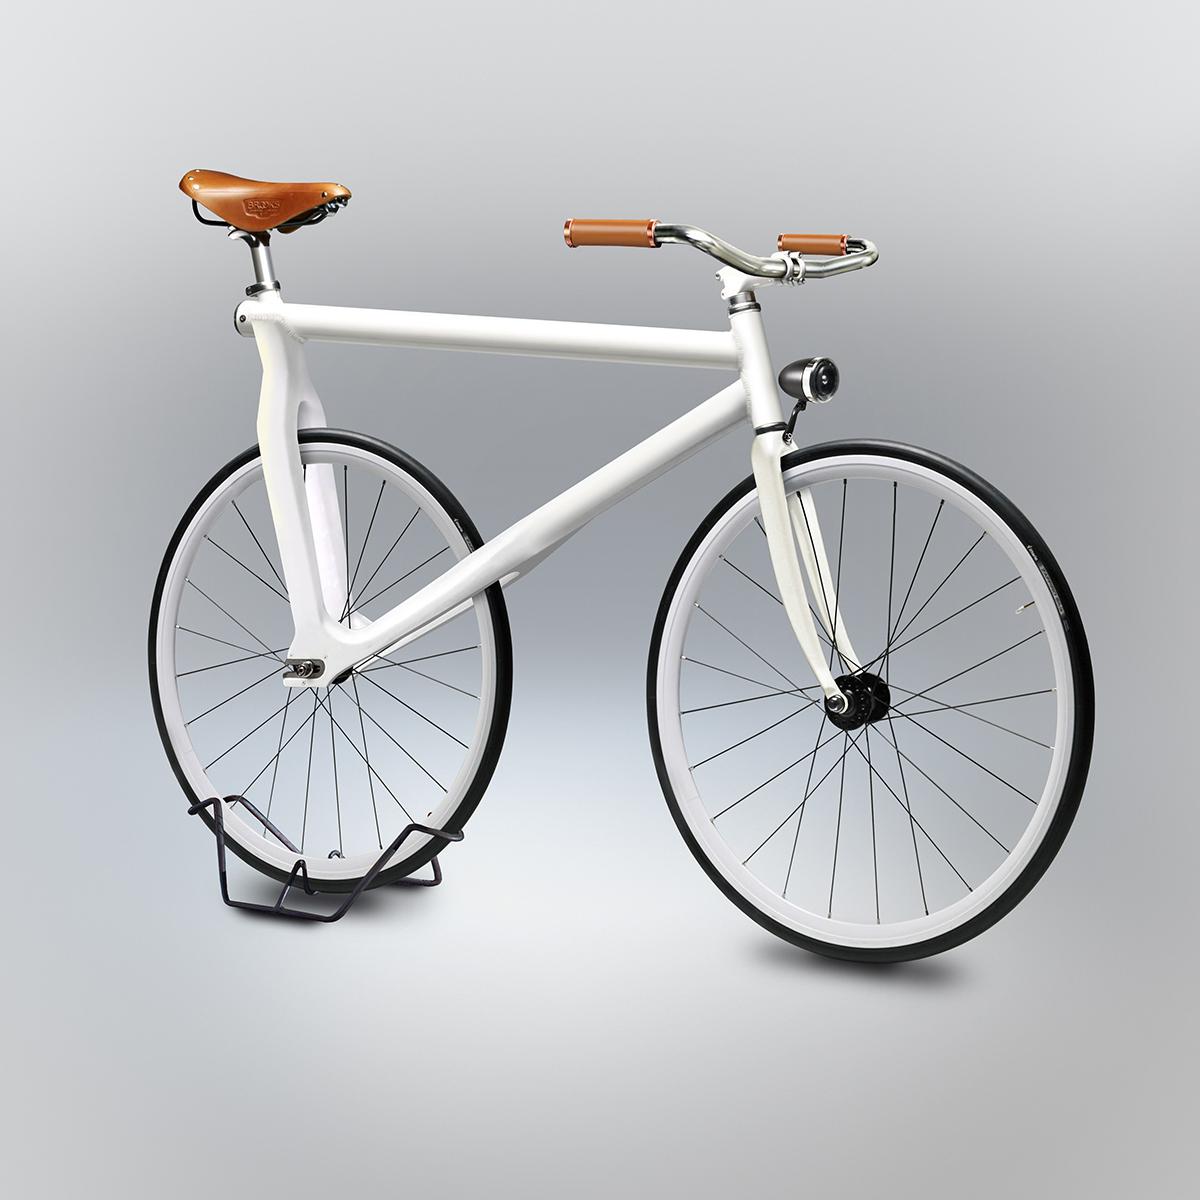 Drawn bike bicycle Album on Gimini out Imgur